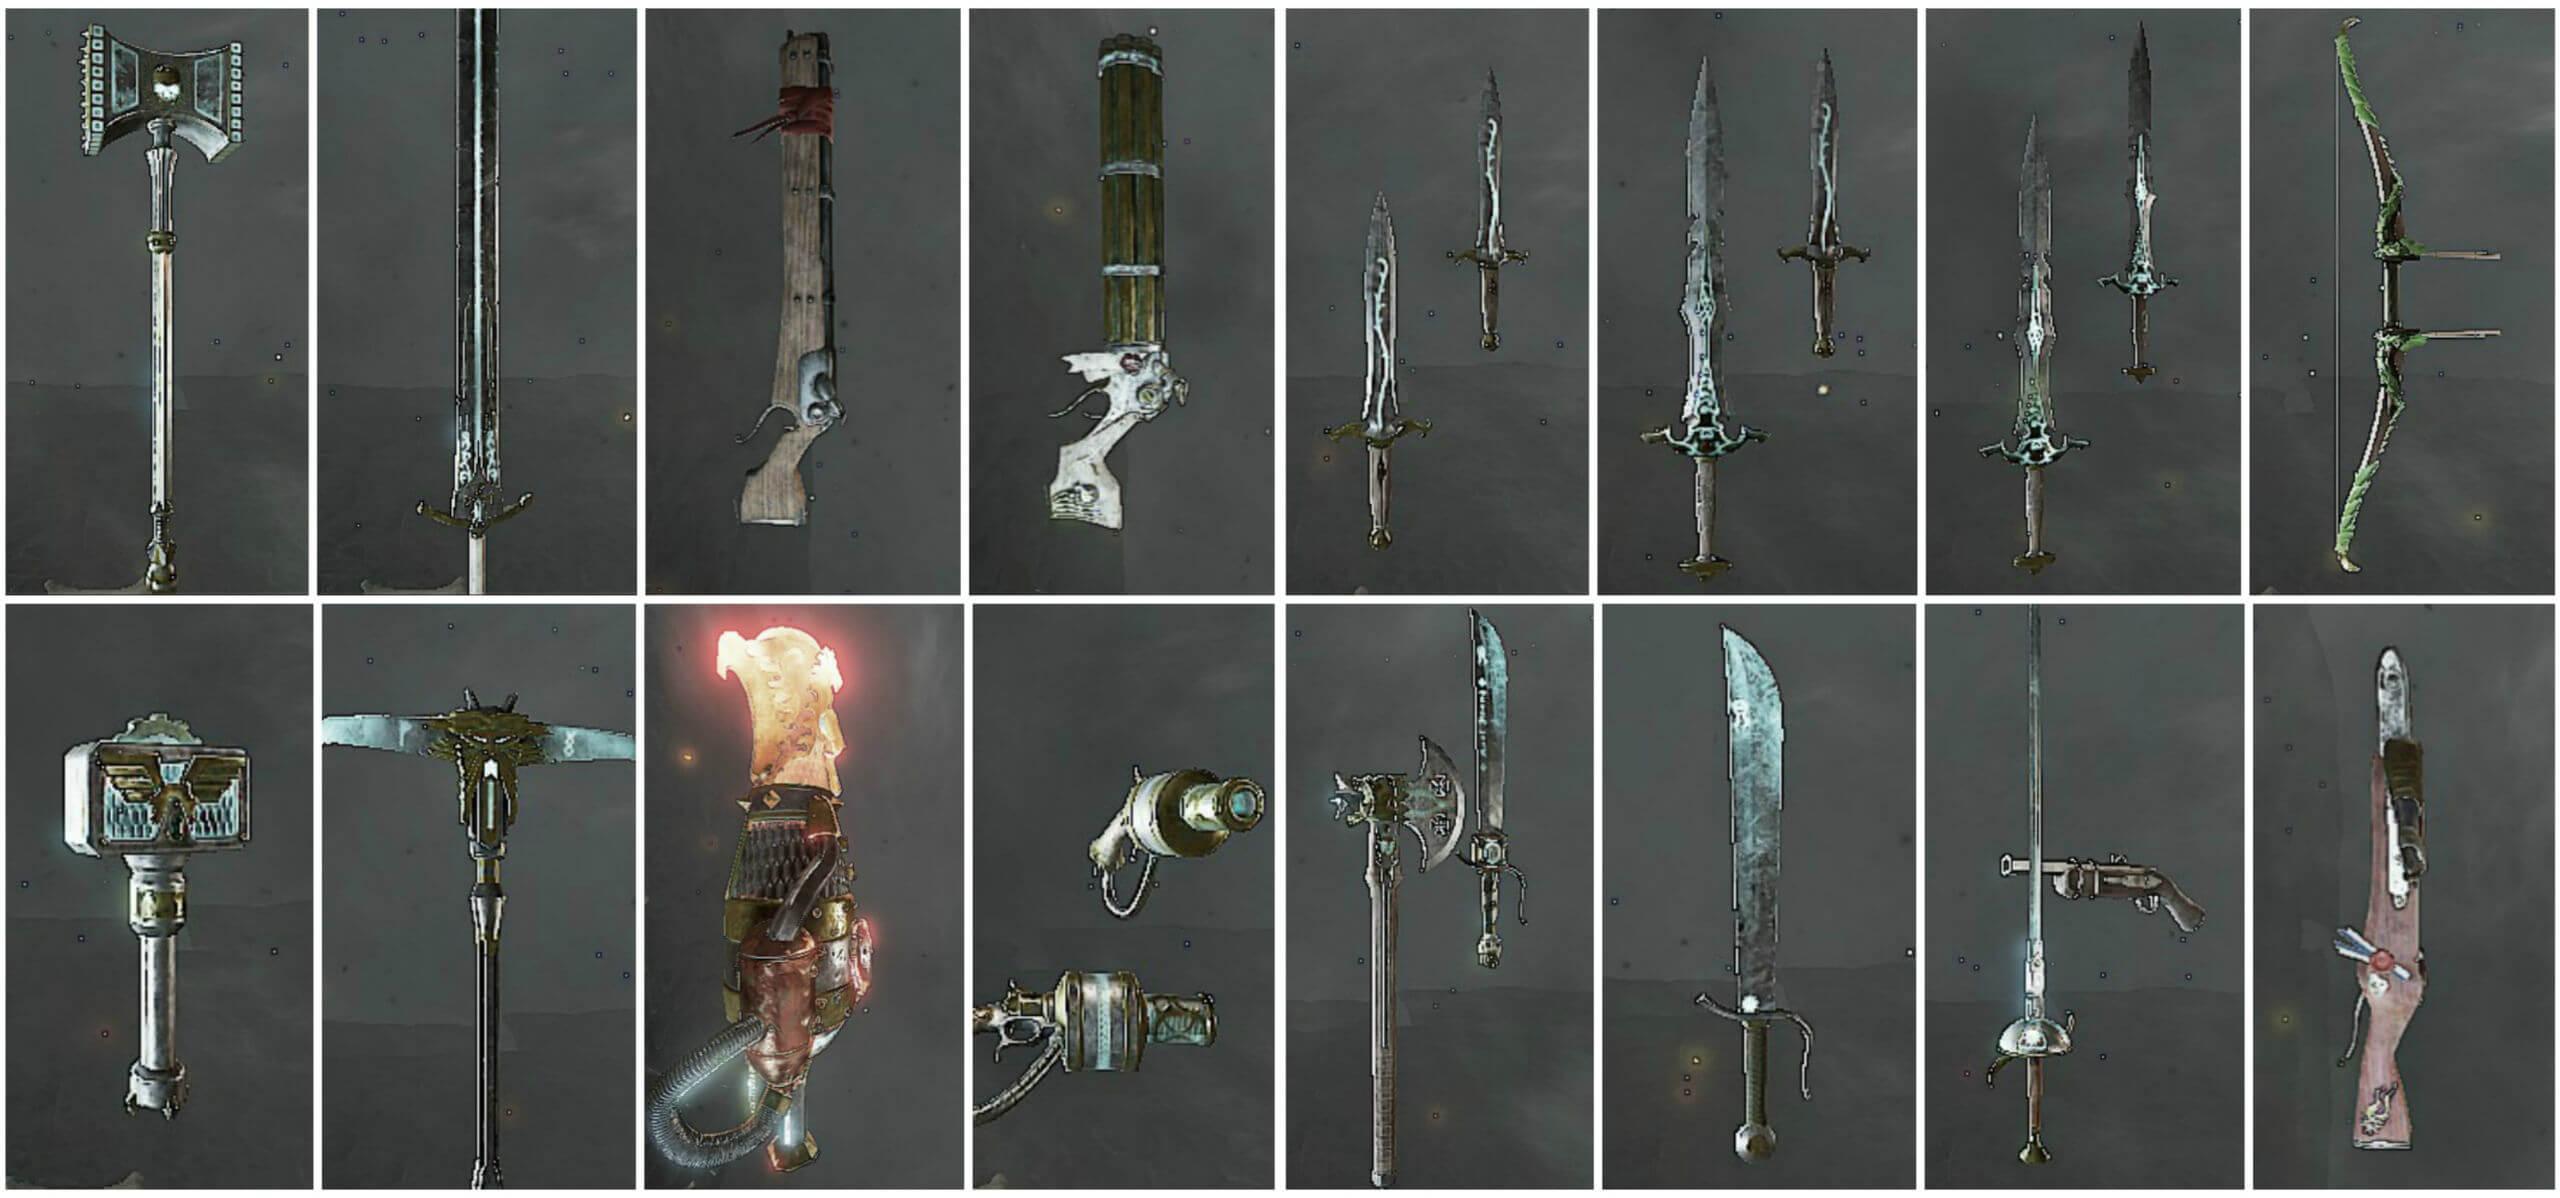 Как пройти Fortunes of War в Warhammer: Vermintide 2